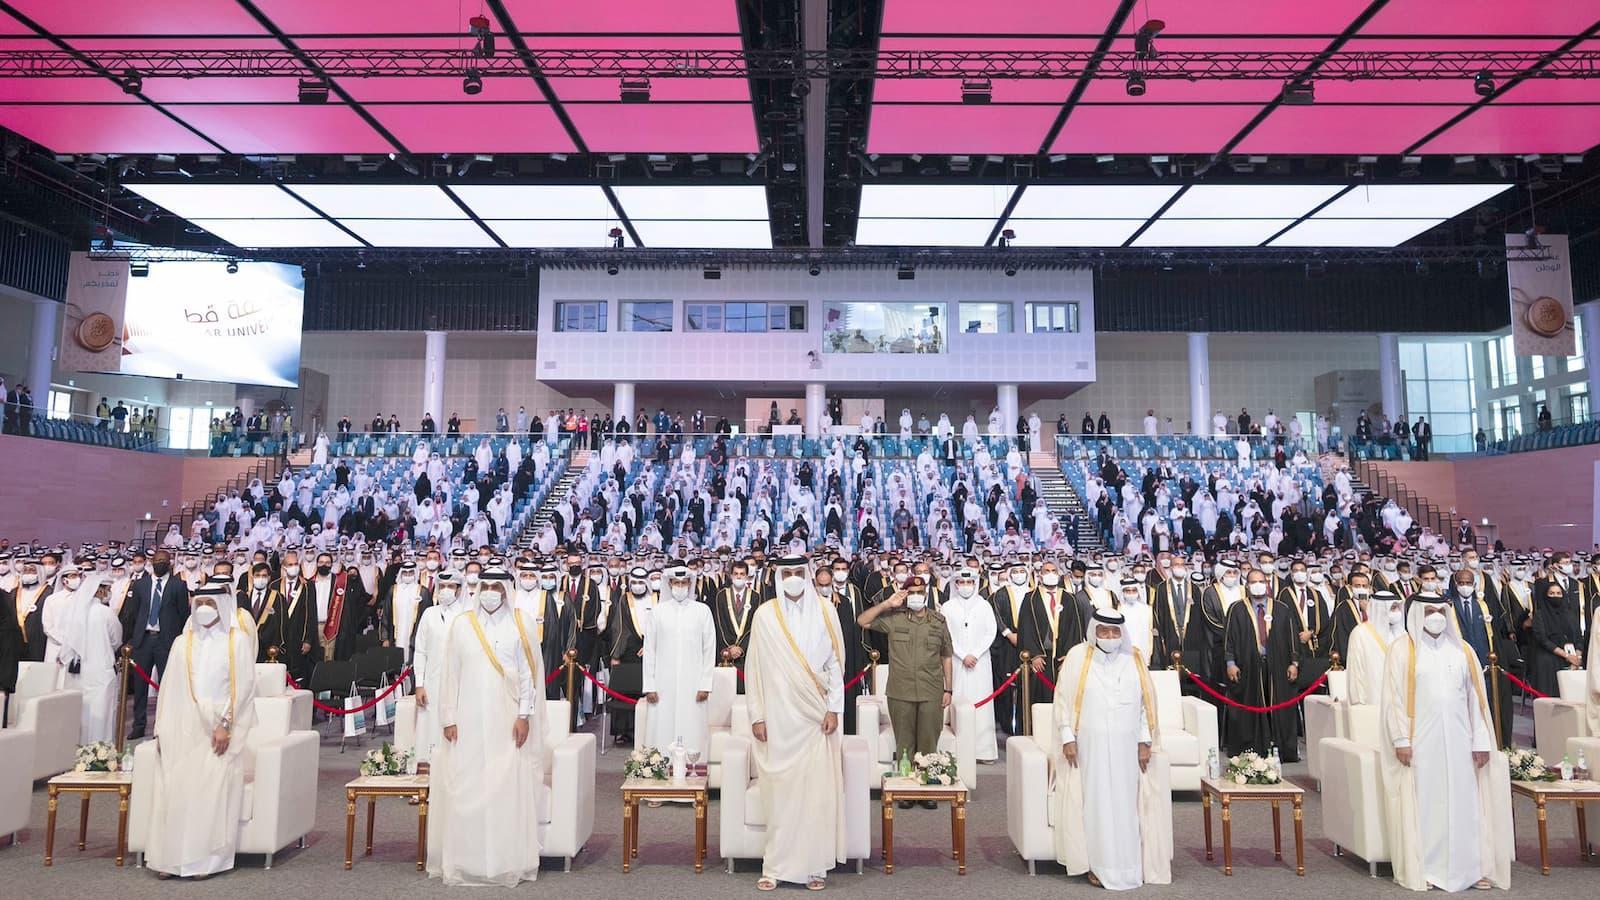 Qatar University's College of Medicine celebrates the graduation of its first batch